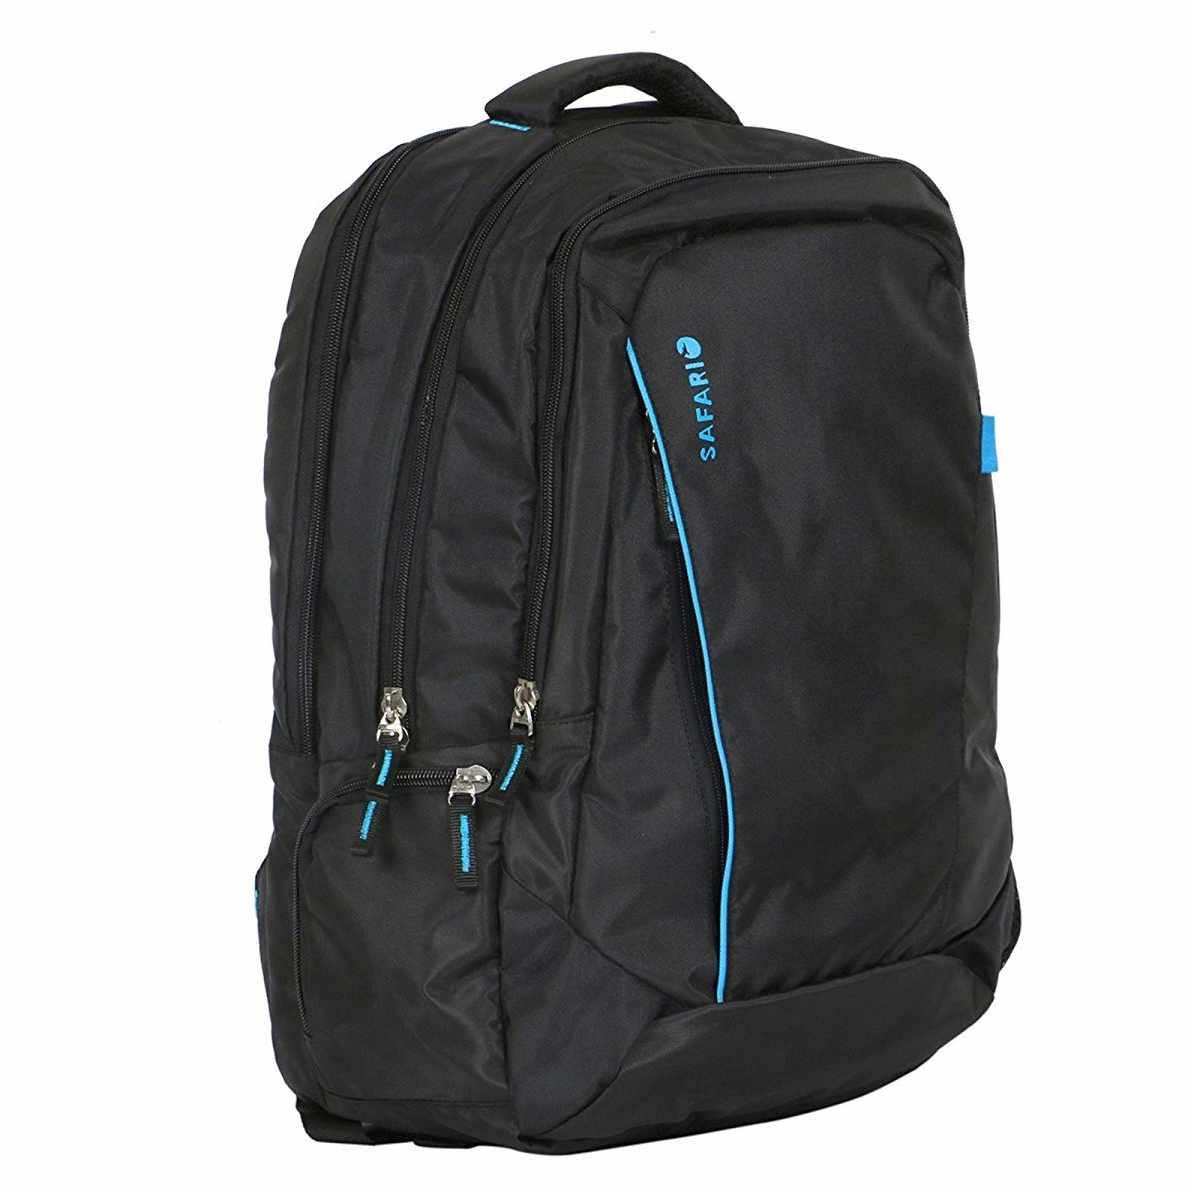 Safari Nirvana Laptop Backpack Bag Sunrise Trading Co